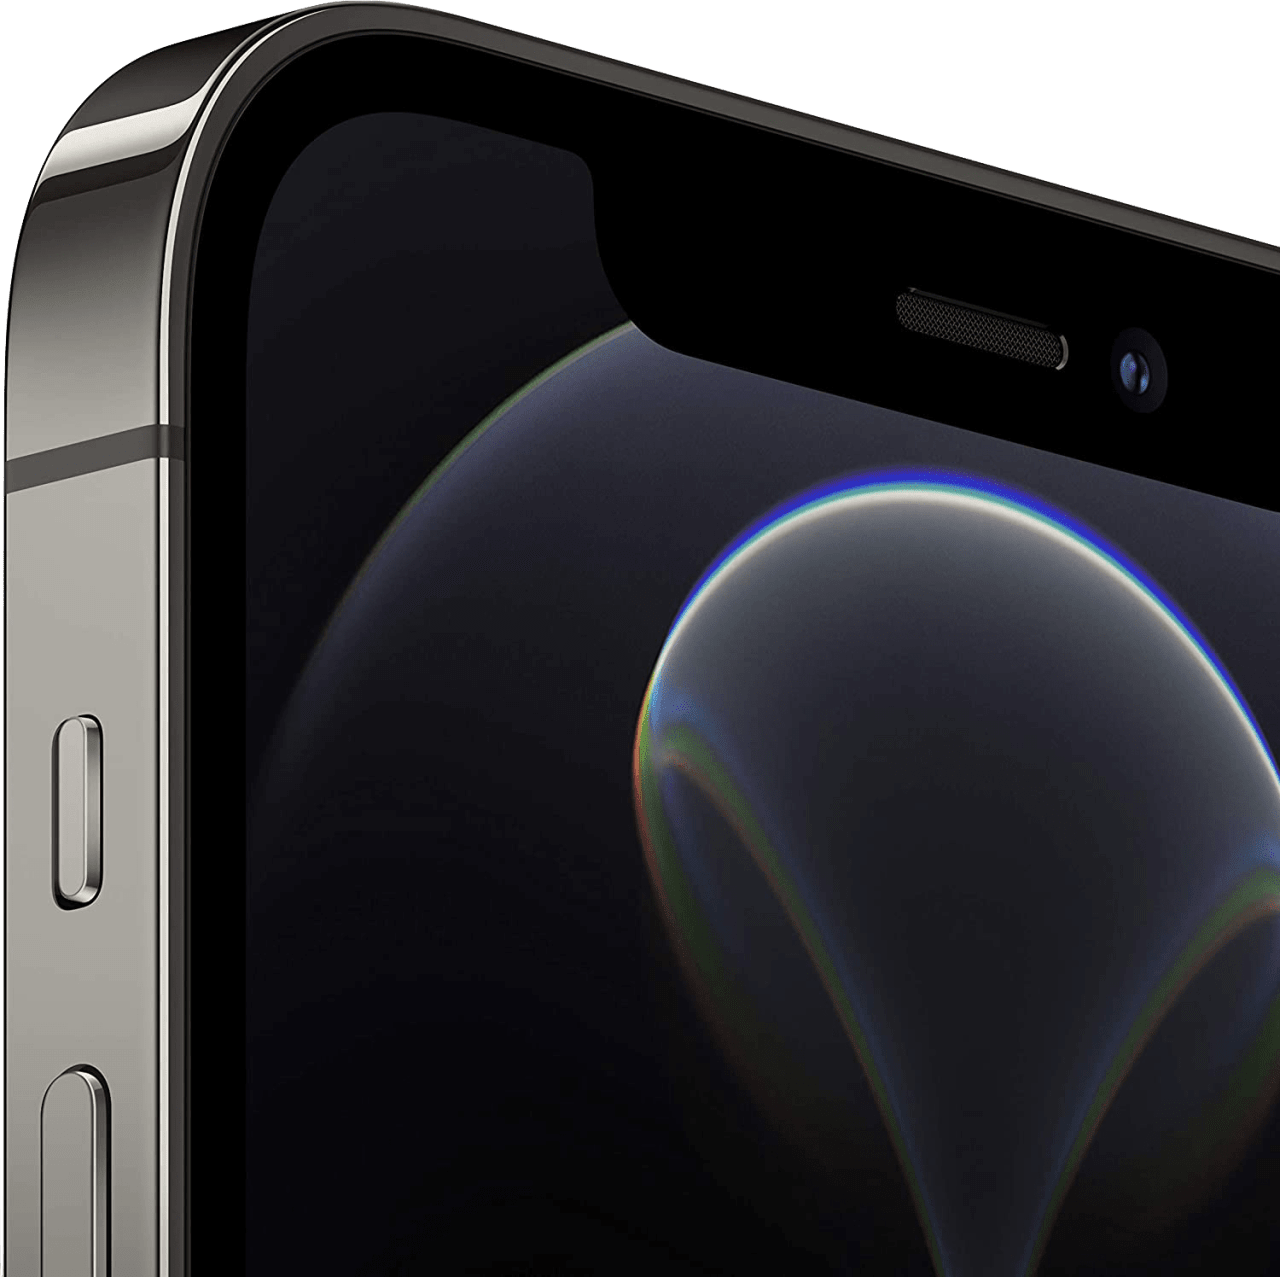 Grau Apple iPhone 12 Pro Max 512GB.3